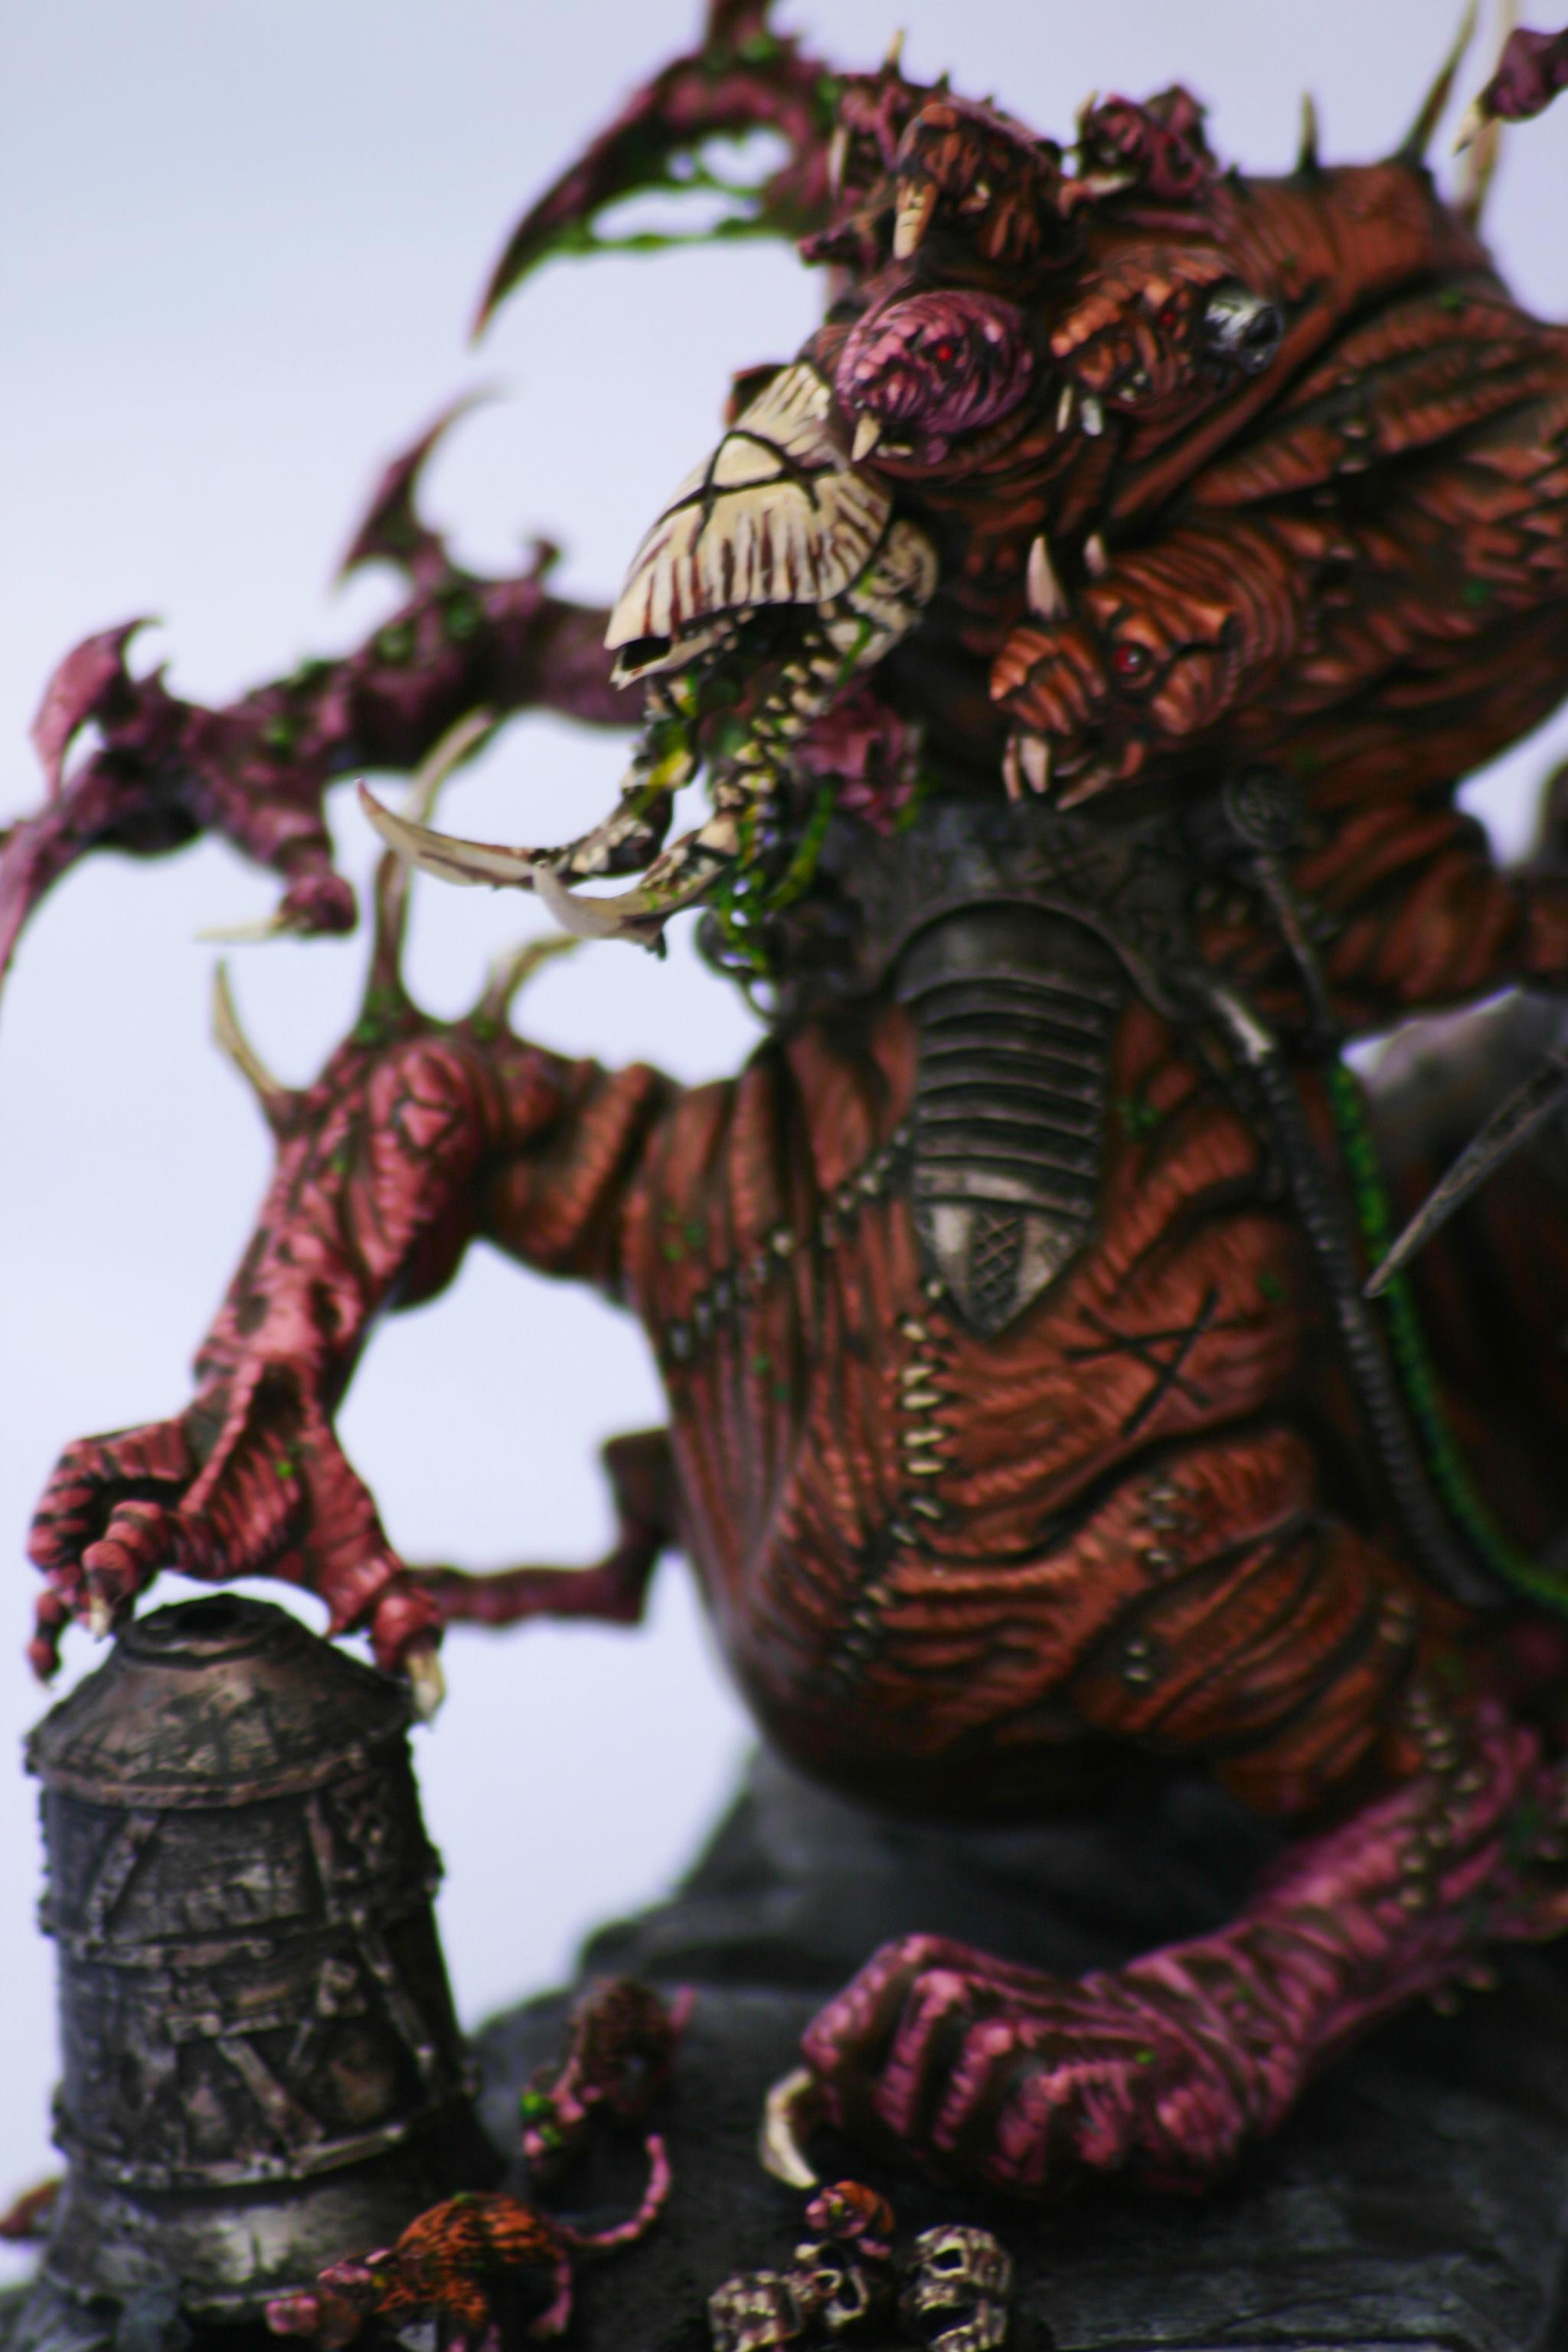 Hell Pit Abomination, Skaven, Warhammer Fantasy